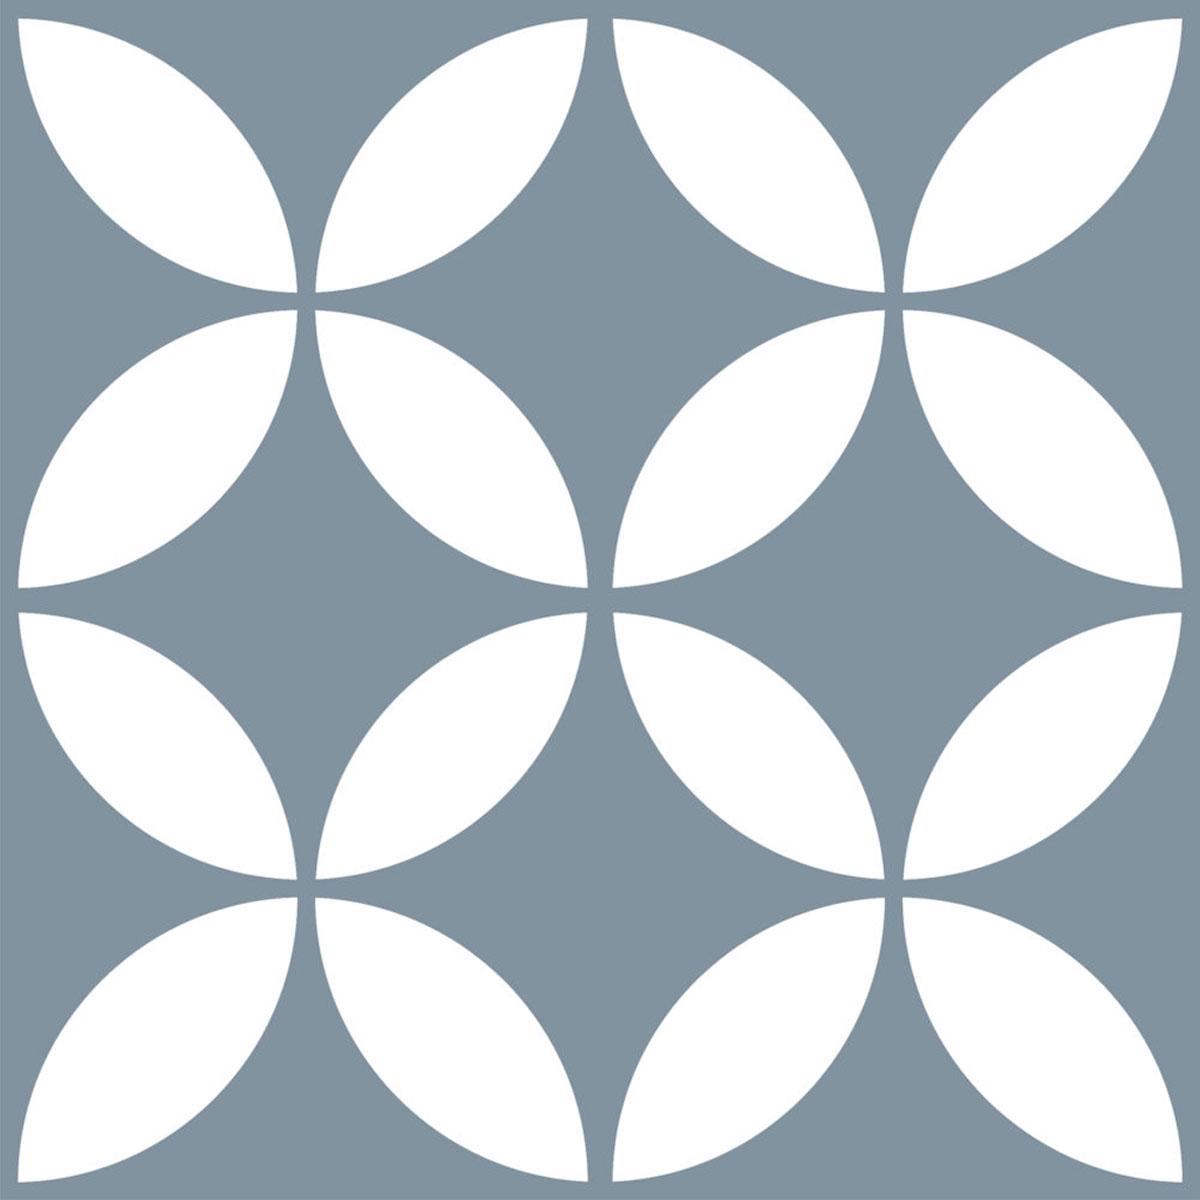 Picasso Evolution - Star Baby Blue - Patterned Tiles - Stone3 Brisbane